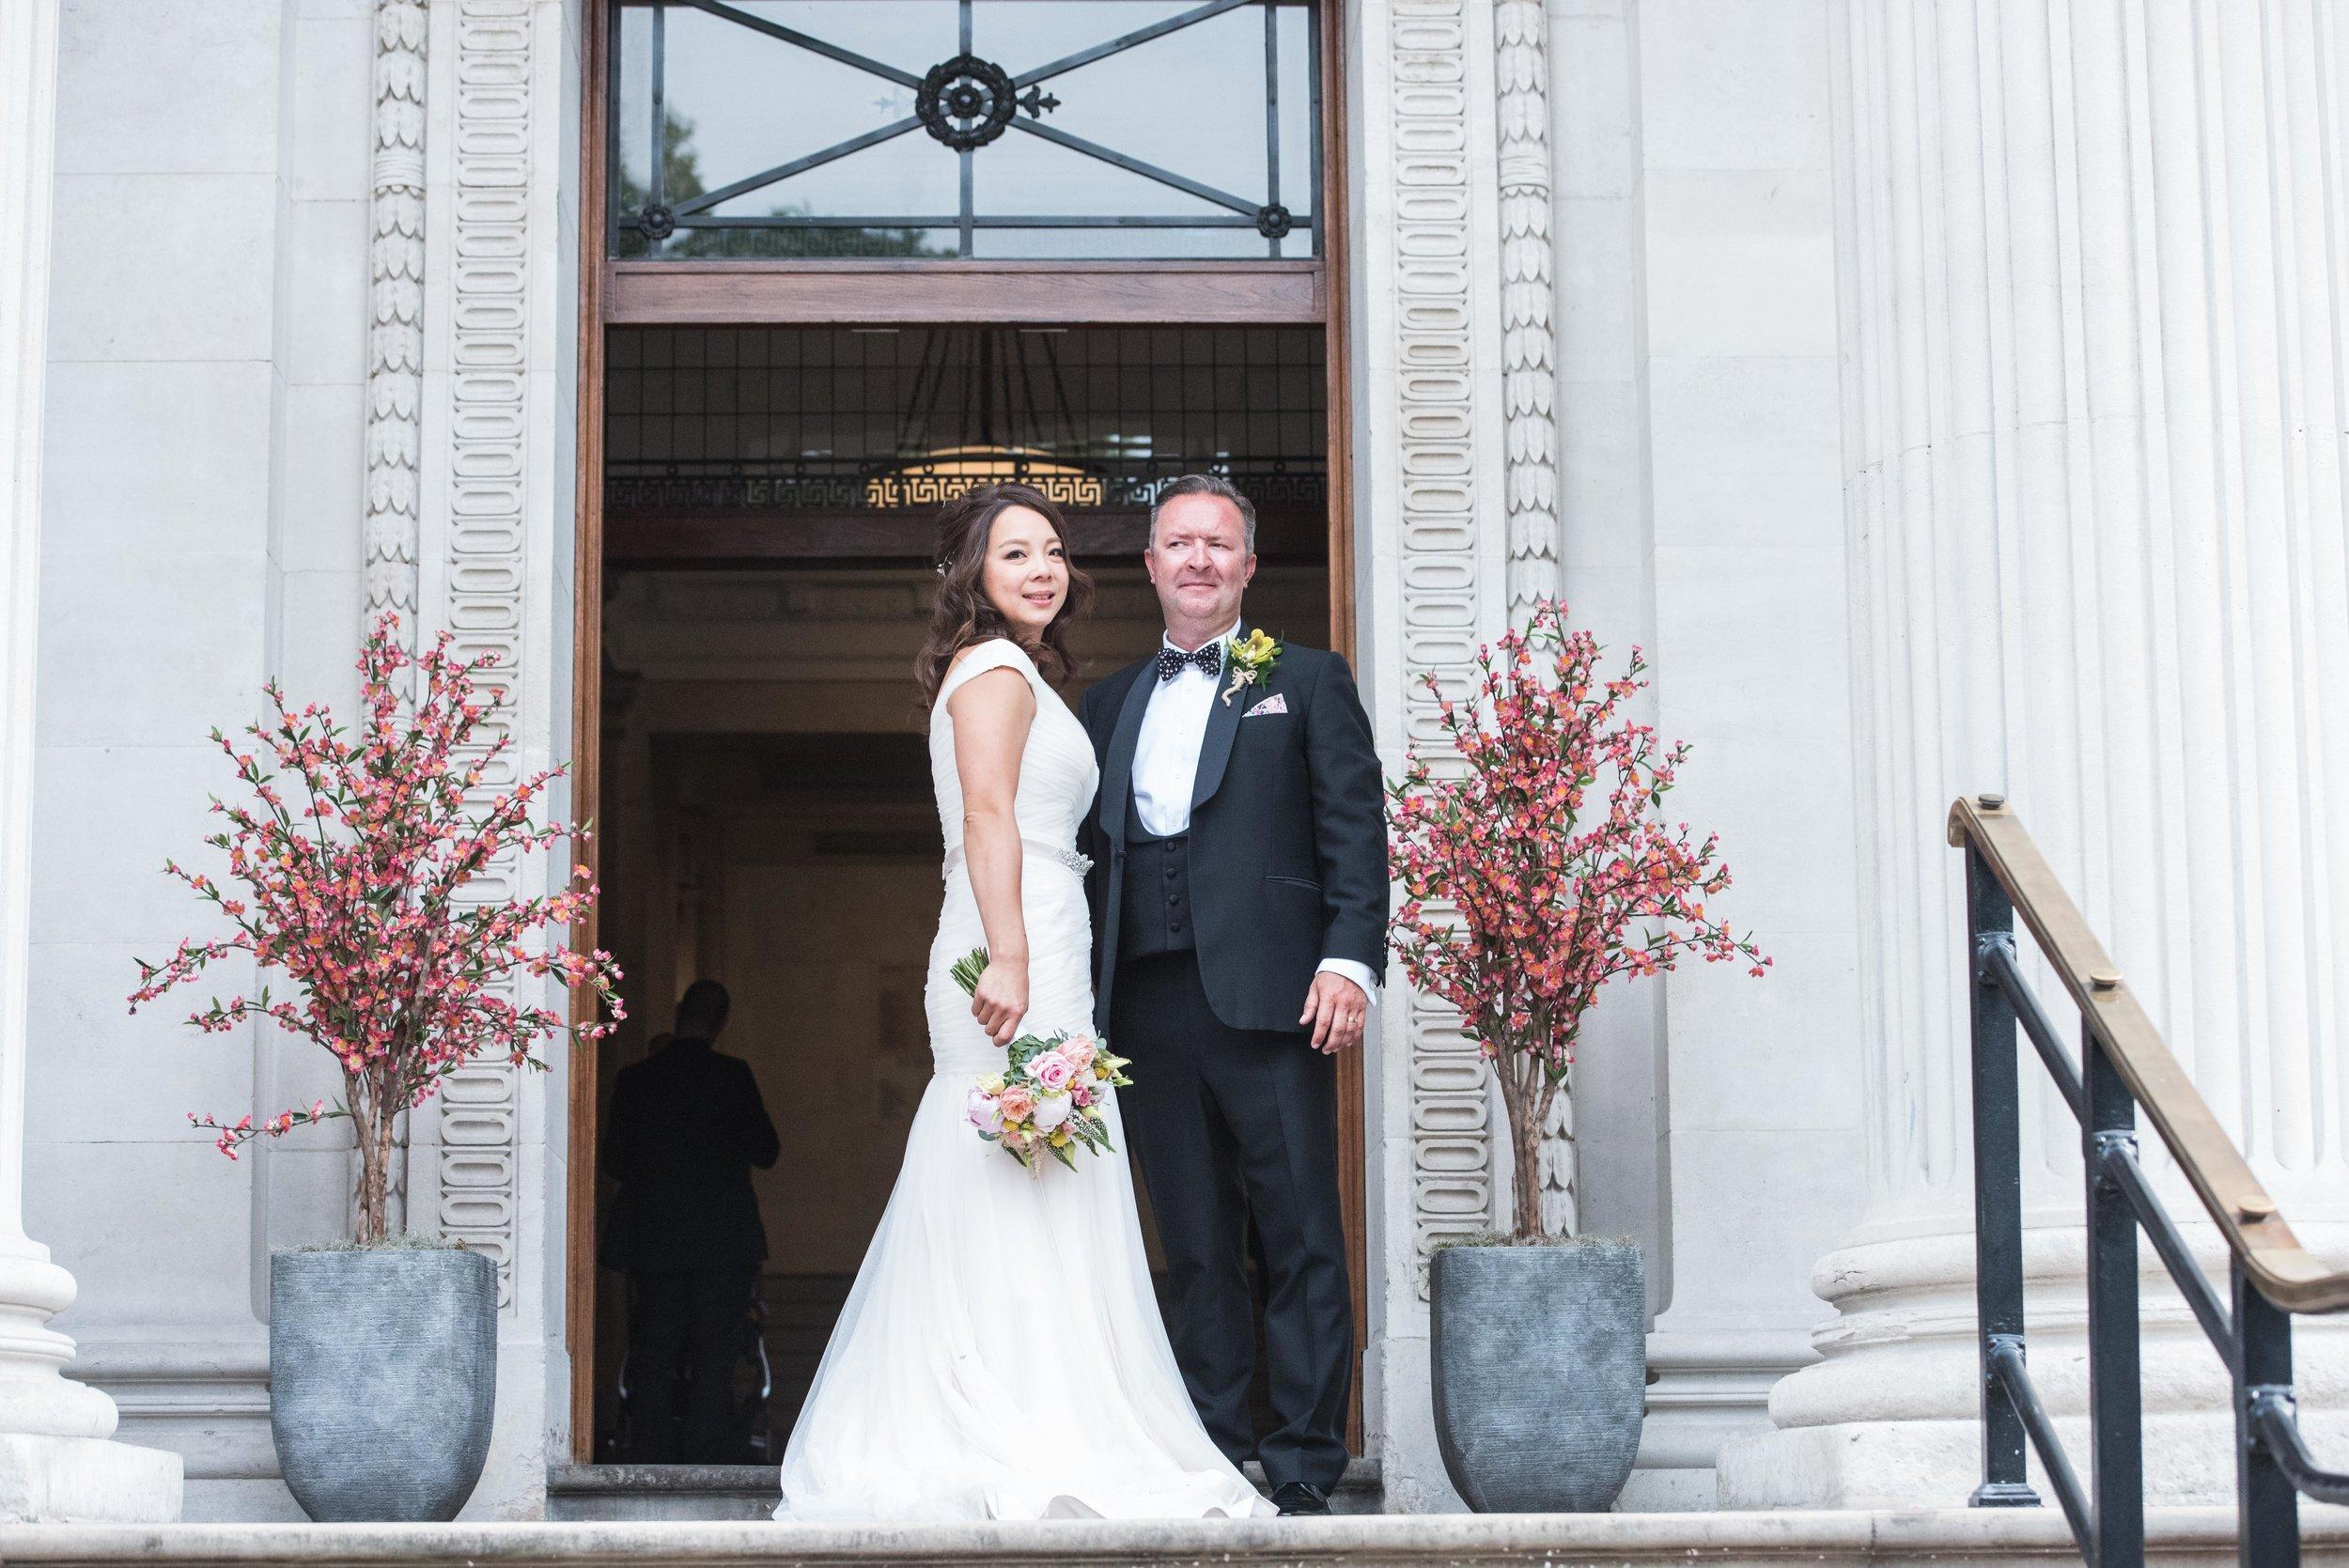 D&M_Marylebone Town Hall Wedding (141 of 239).jpg